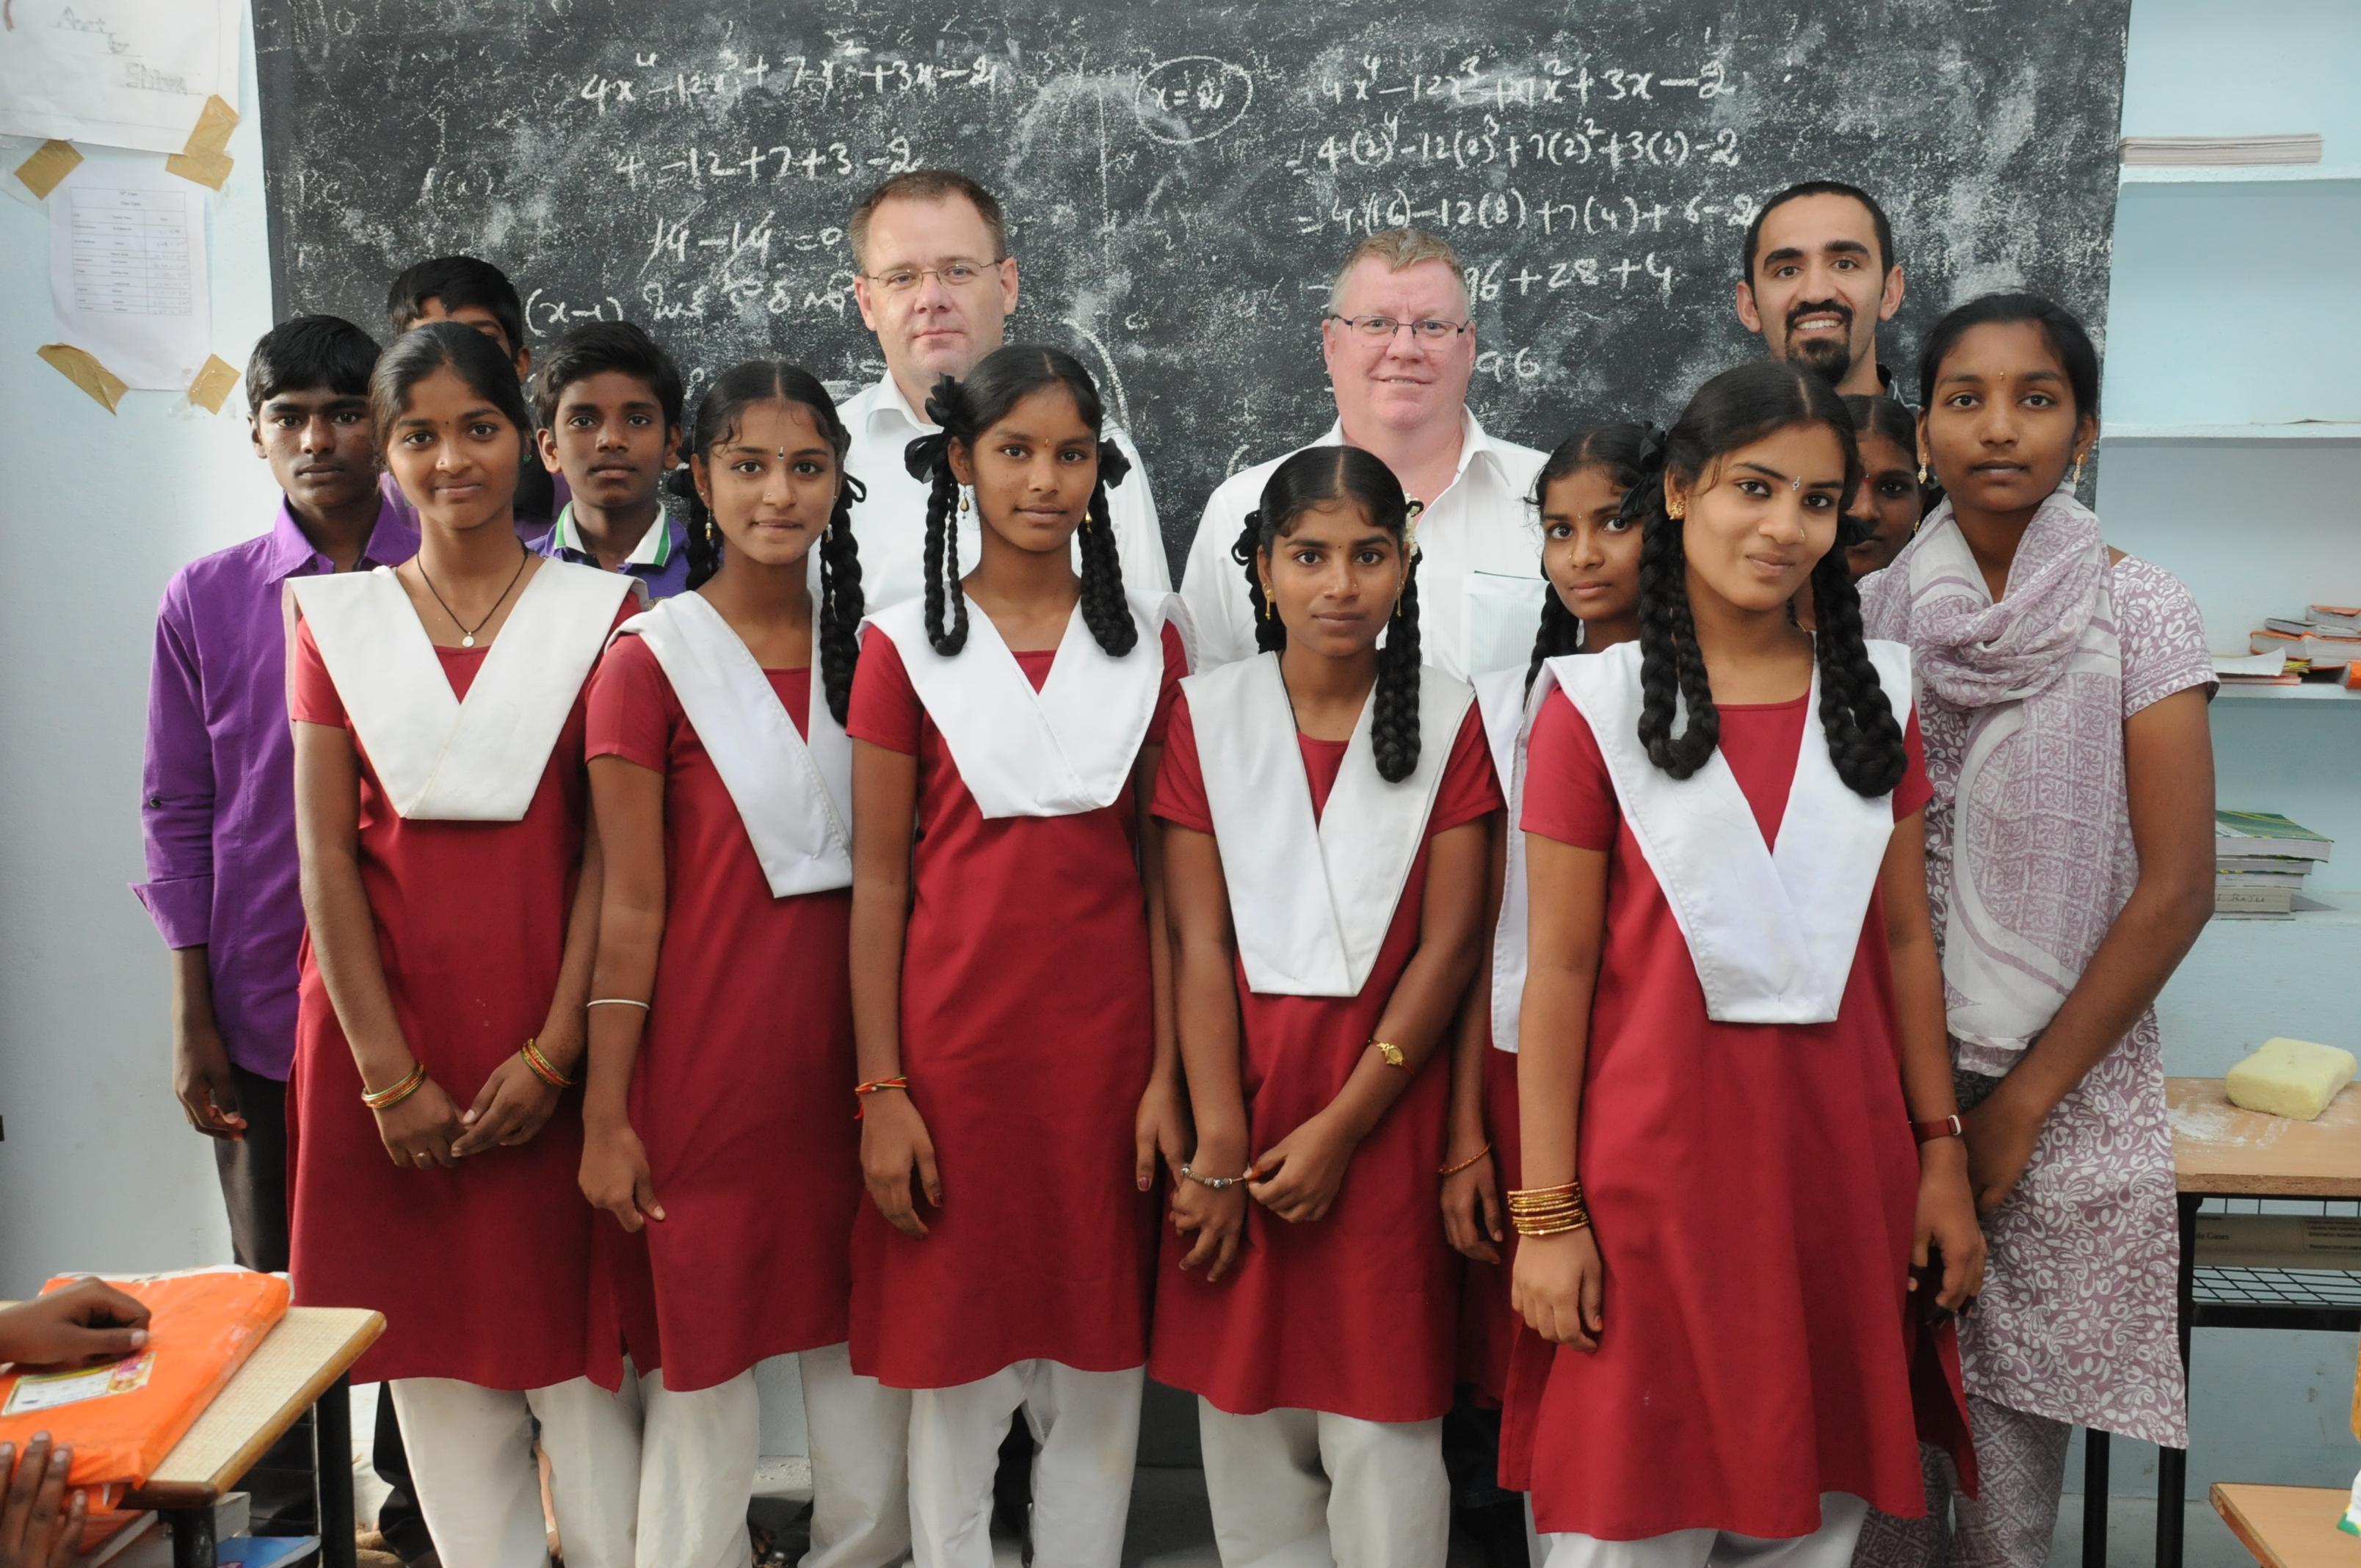 Fashion schools in delhi 19